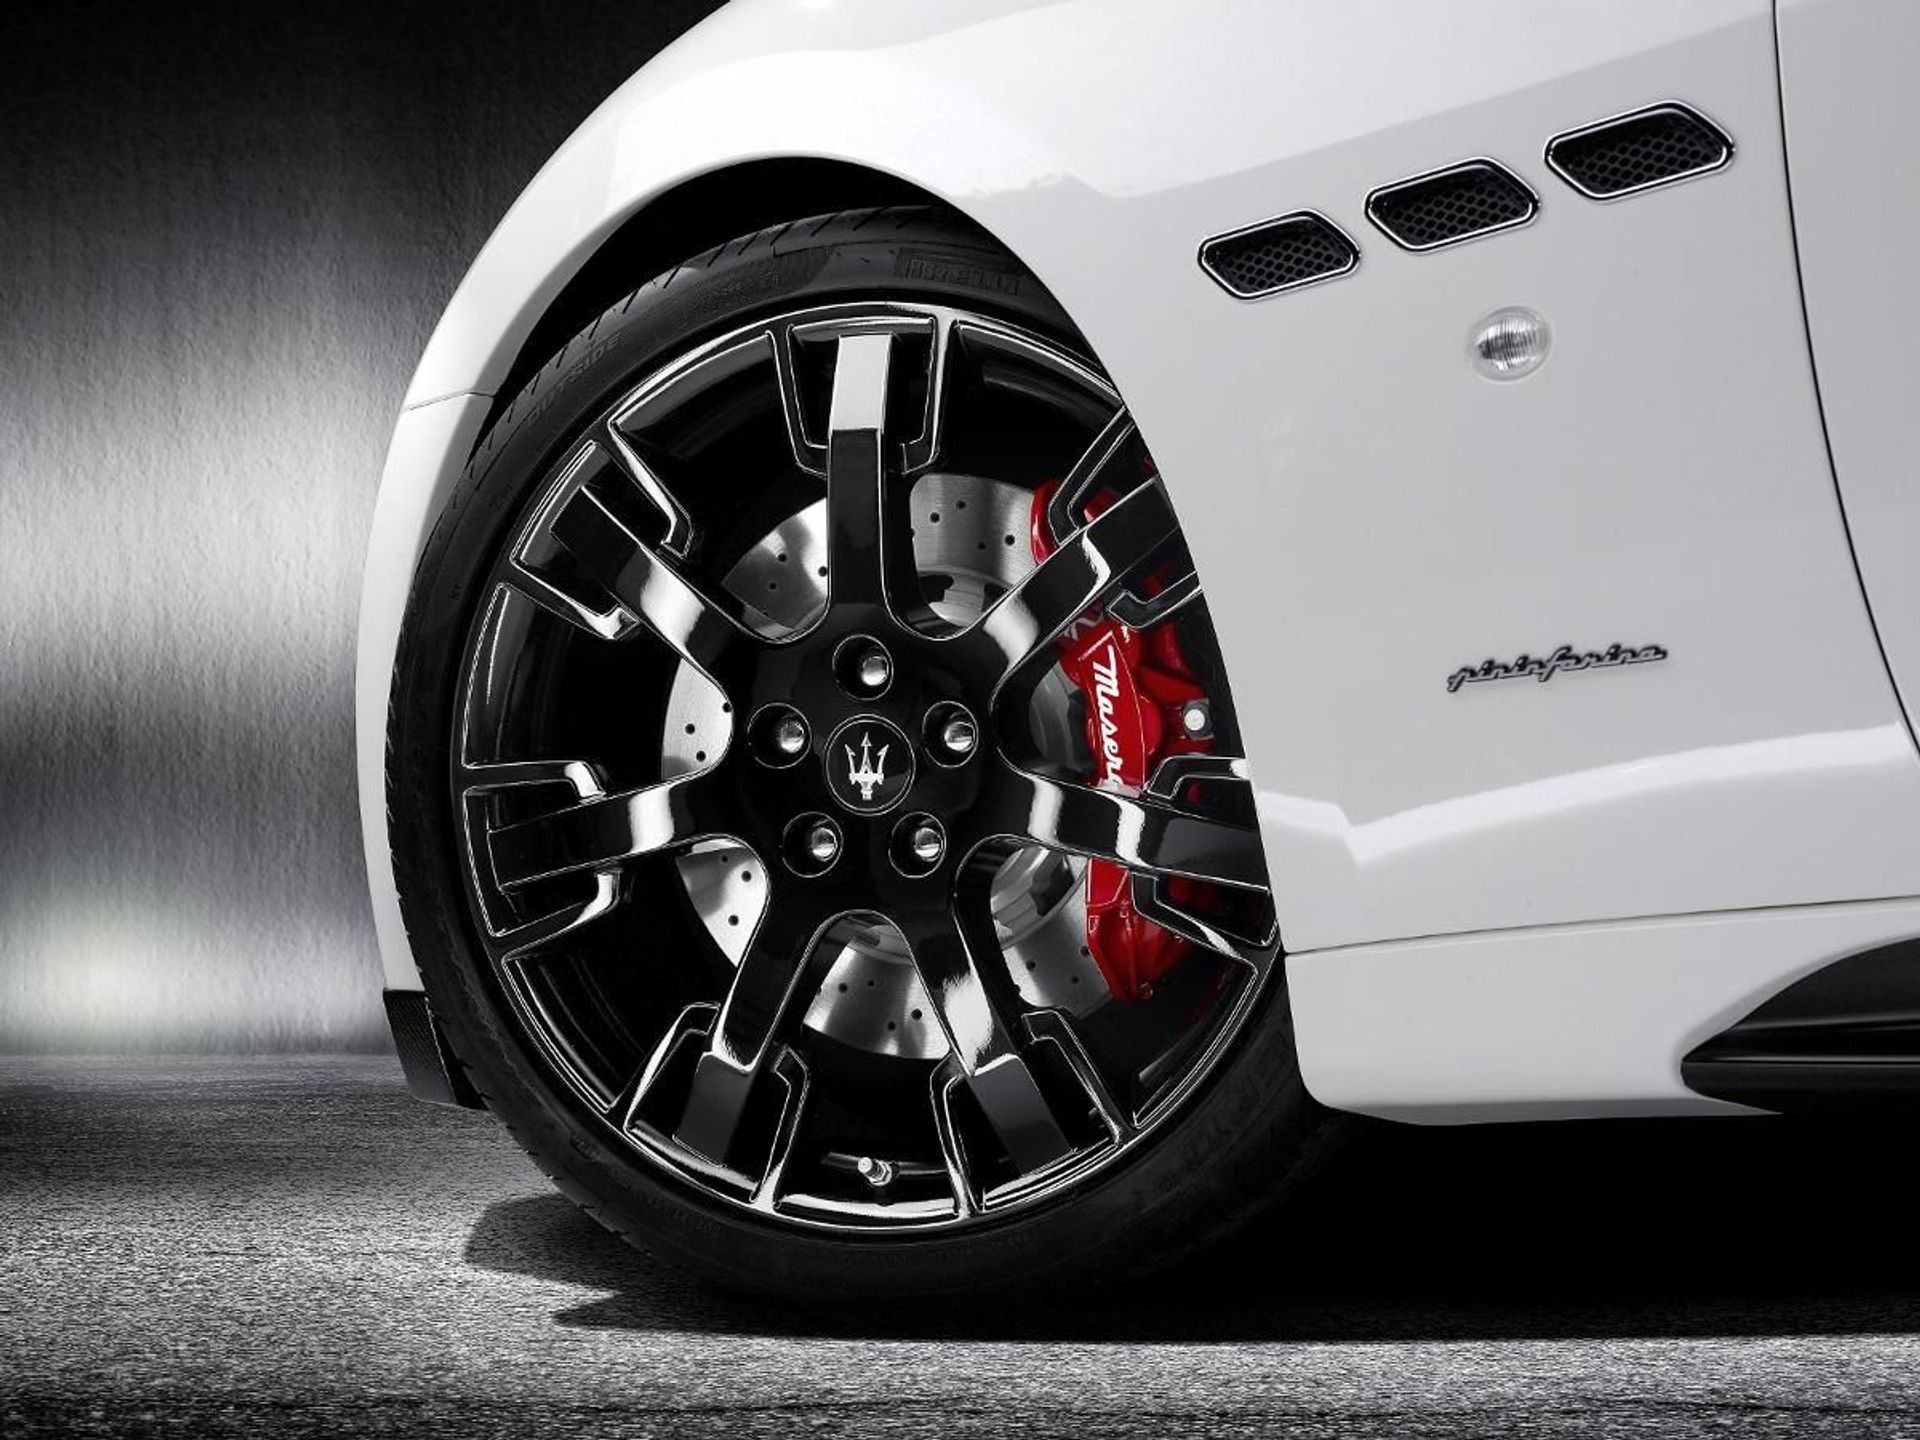 Maserati Granturismo  image